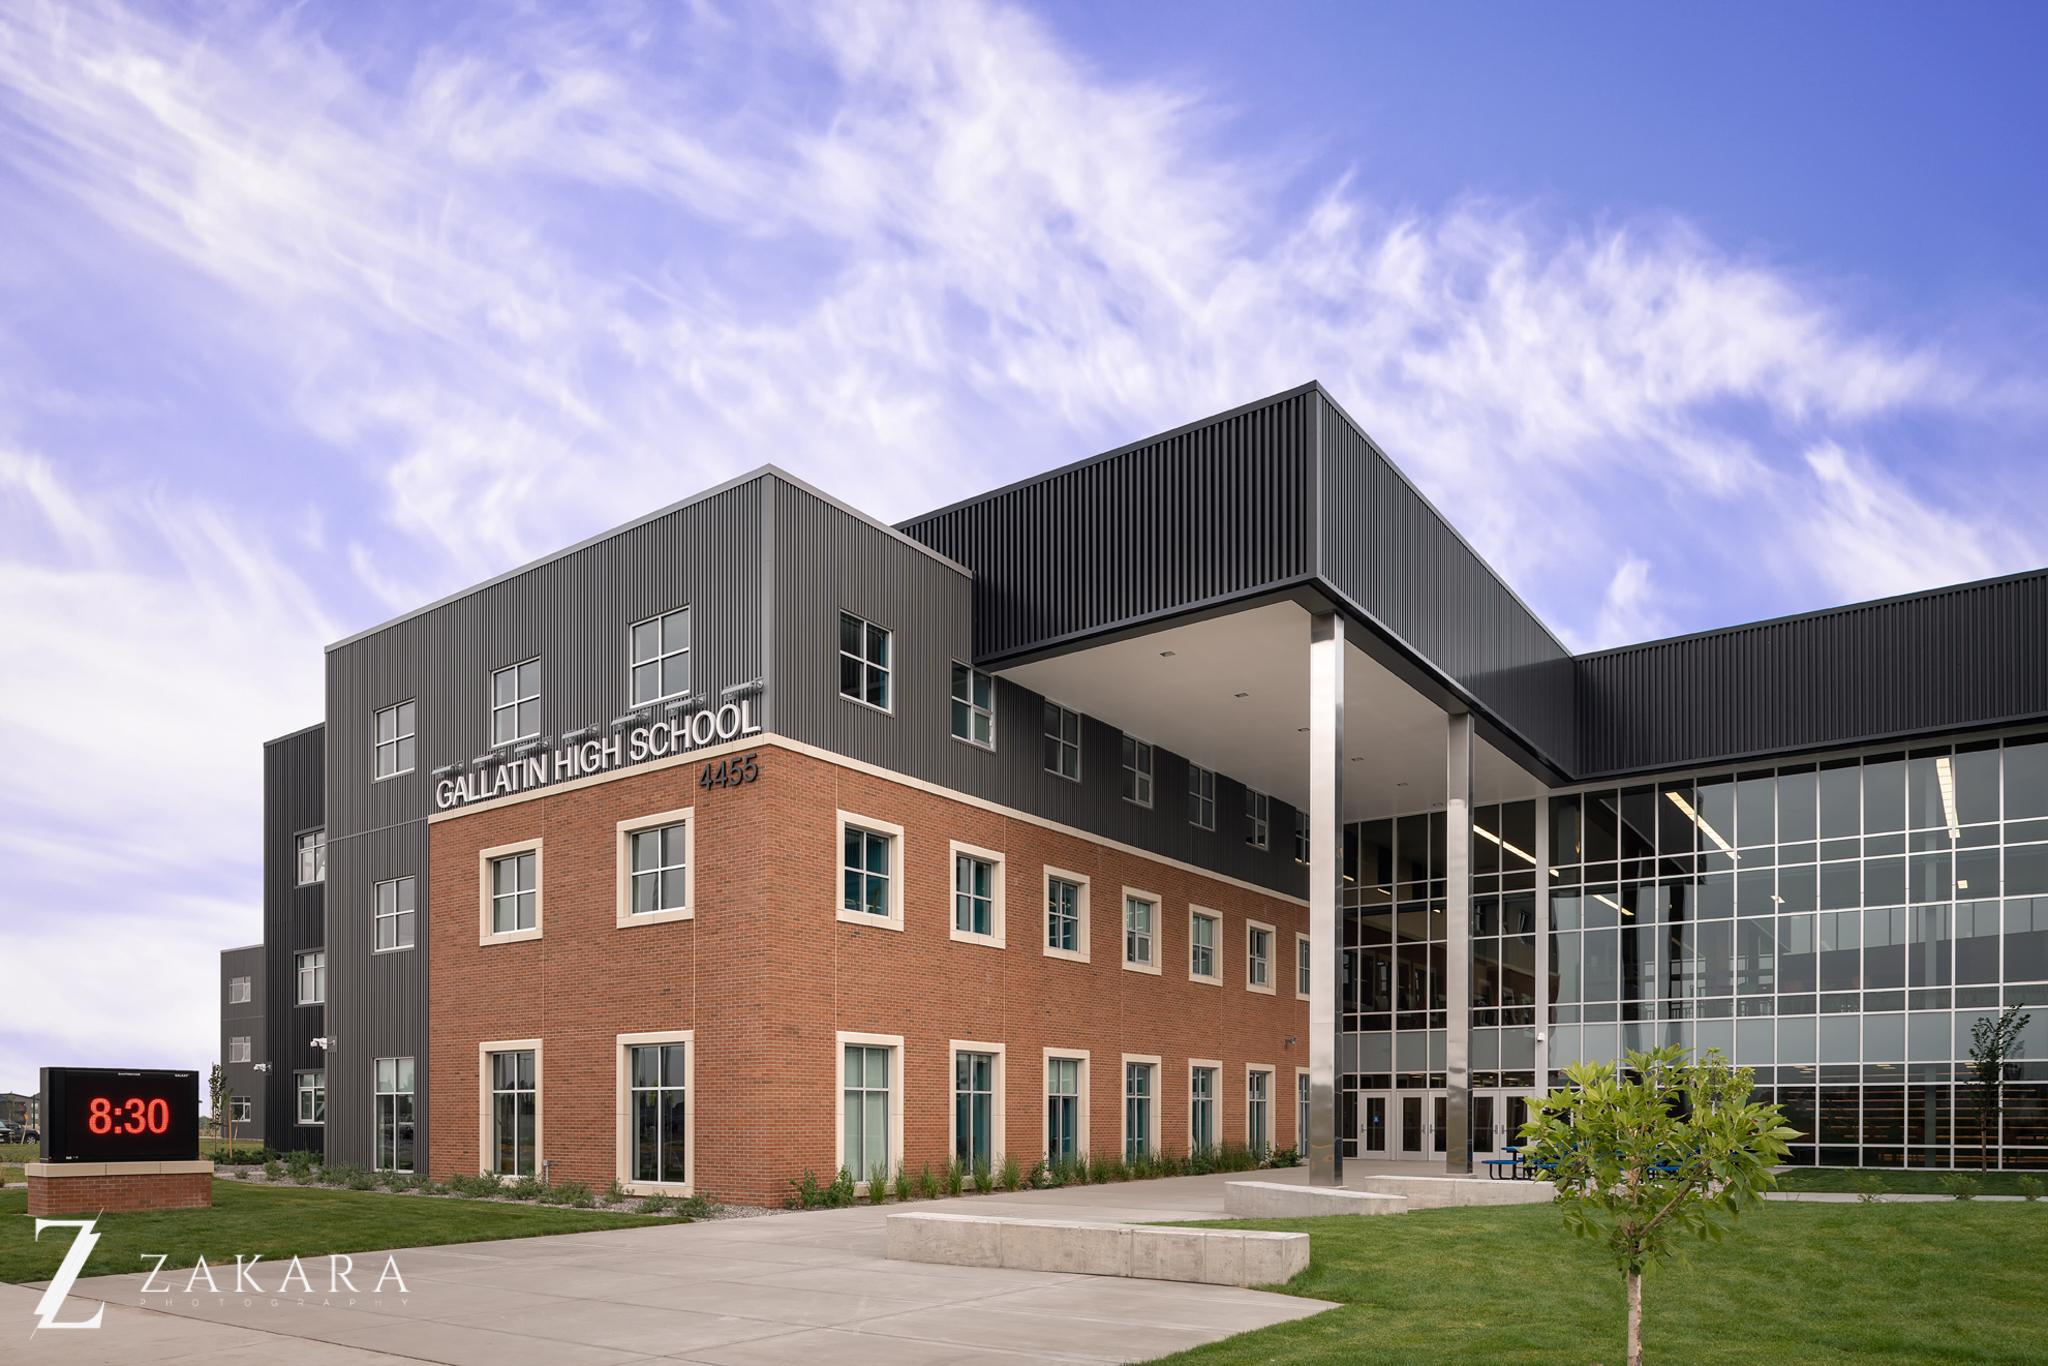 Gallatin High School (01)